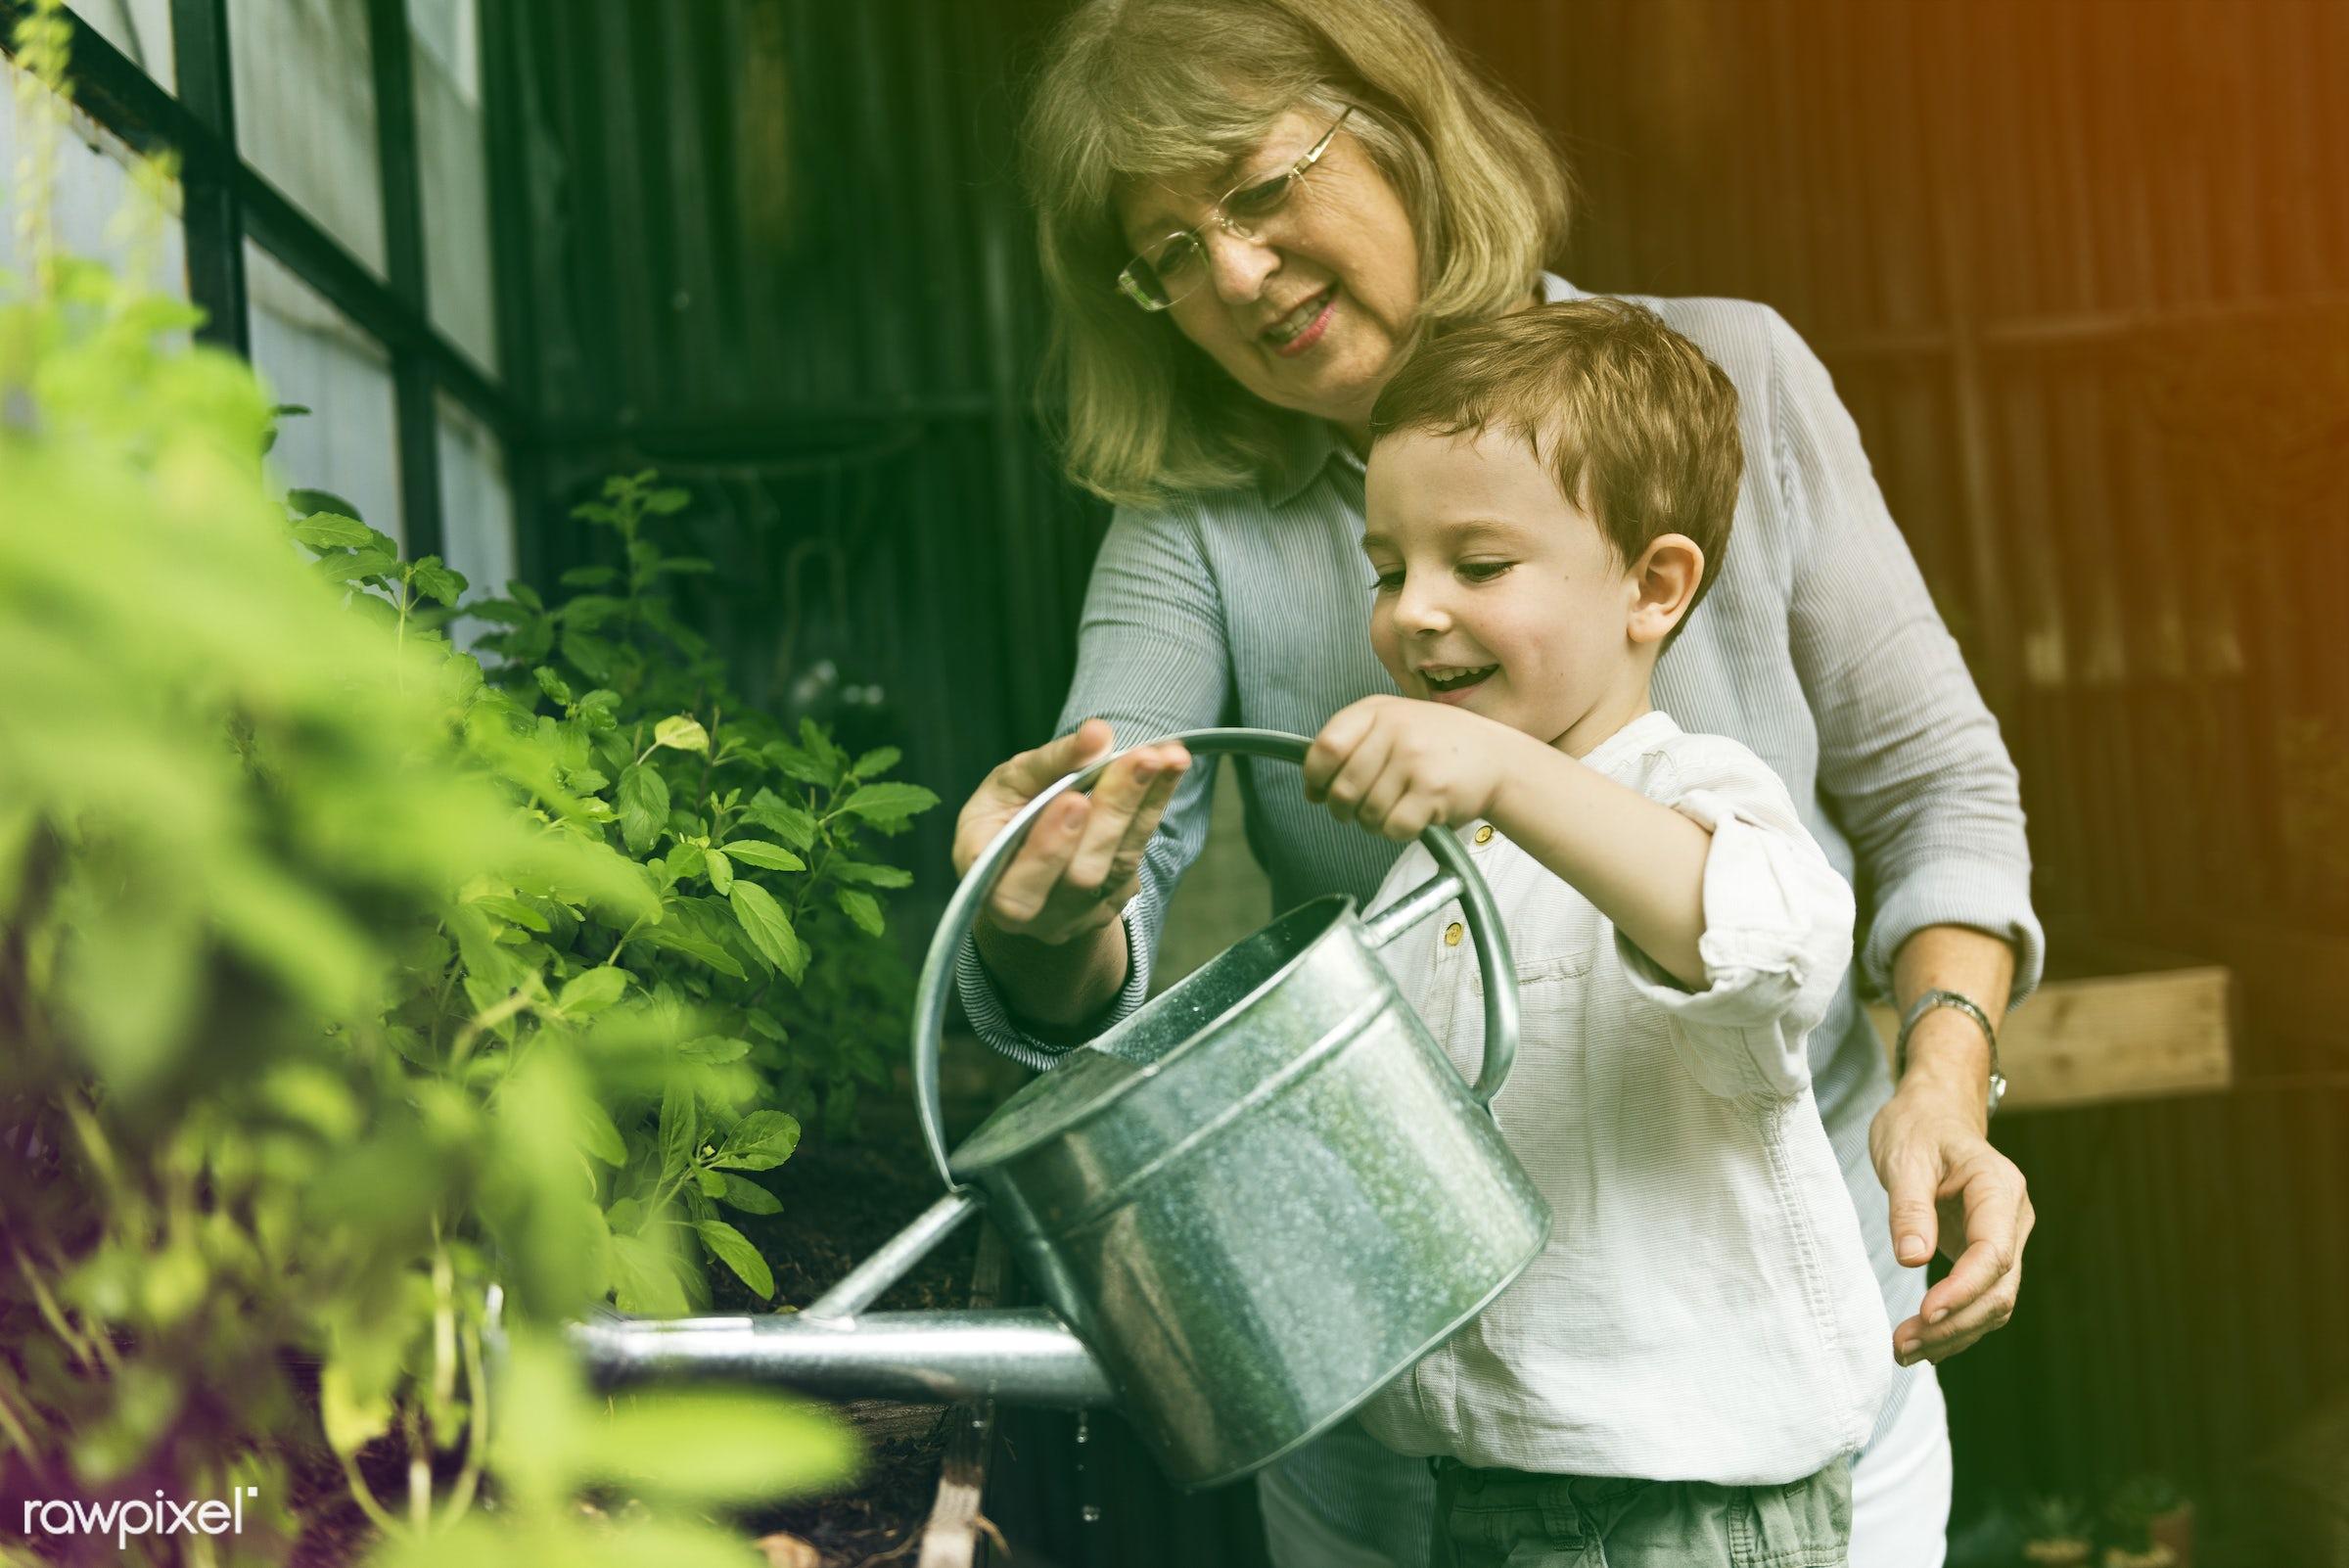 watering, recreation, people, together, kid, nature, woman, interest, childhood, grandson, grandma, generation, hobby,...